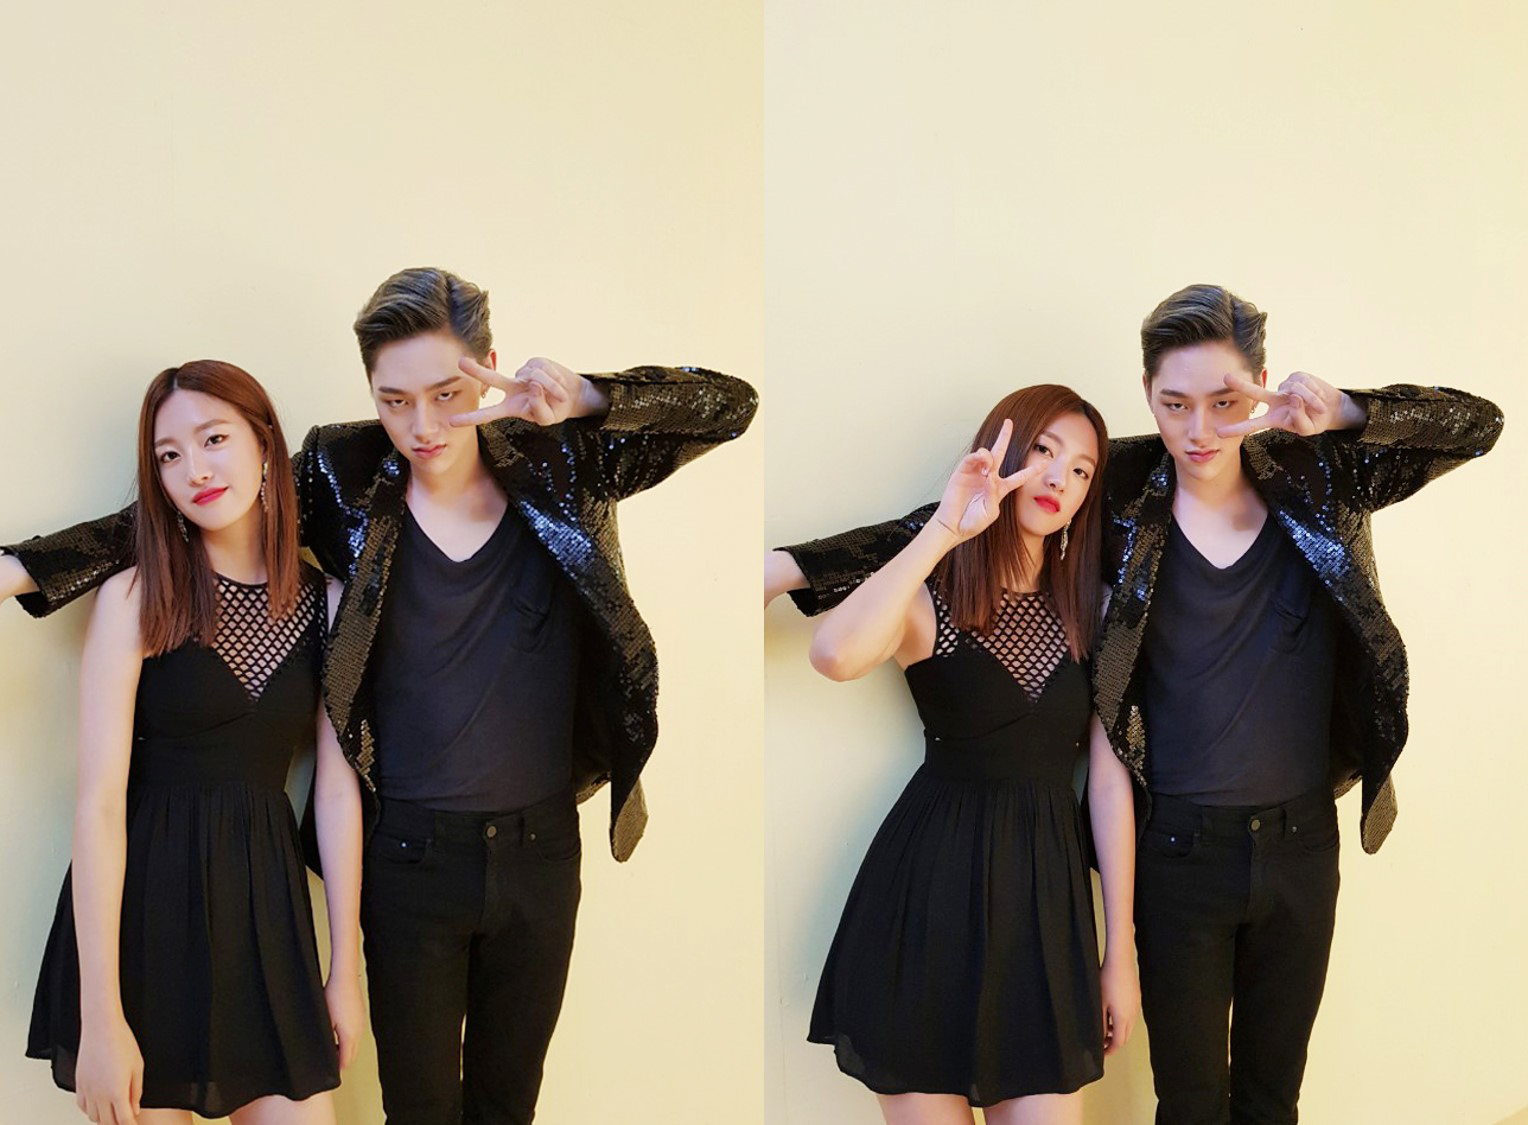 VIINI (권현빈)x이하은, '도깨비방망이' MV 다정한 투 샷 공개!